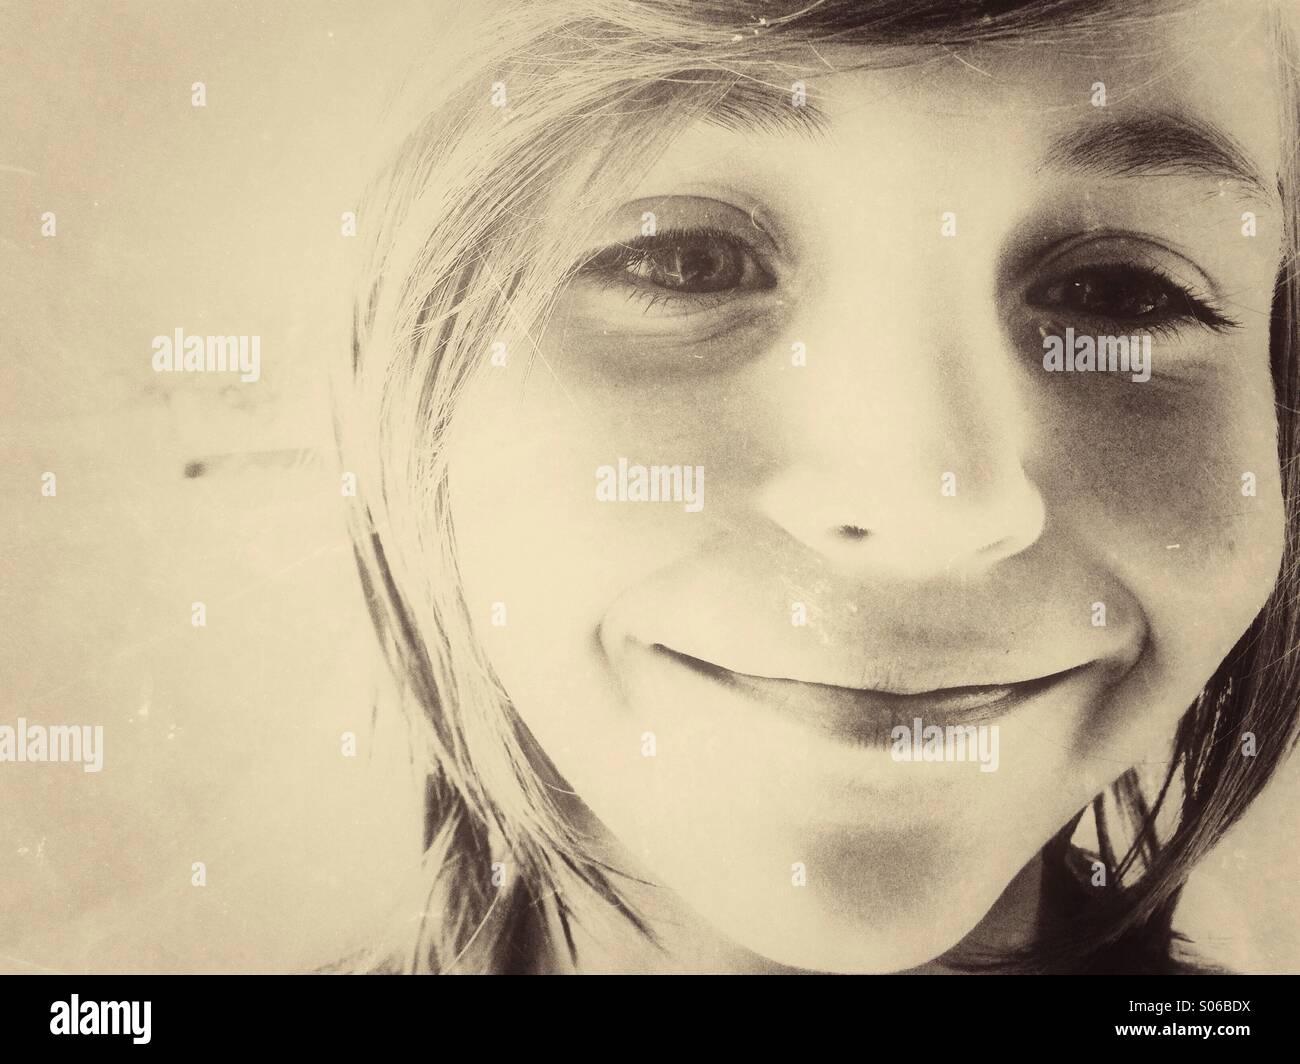 Caucasian boy smiling. Sepia vintage toning. - Stock Image